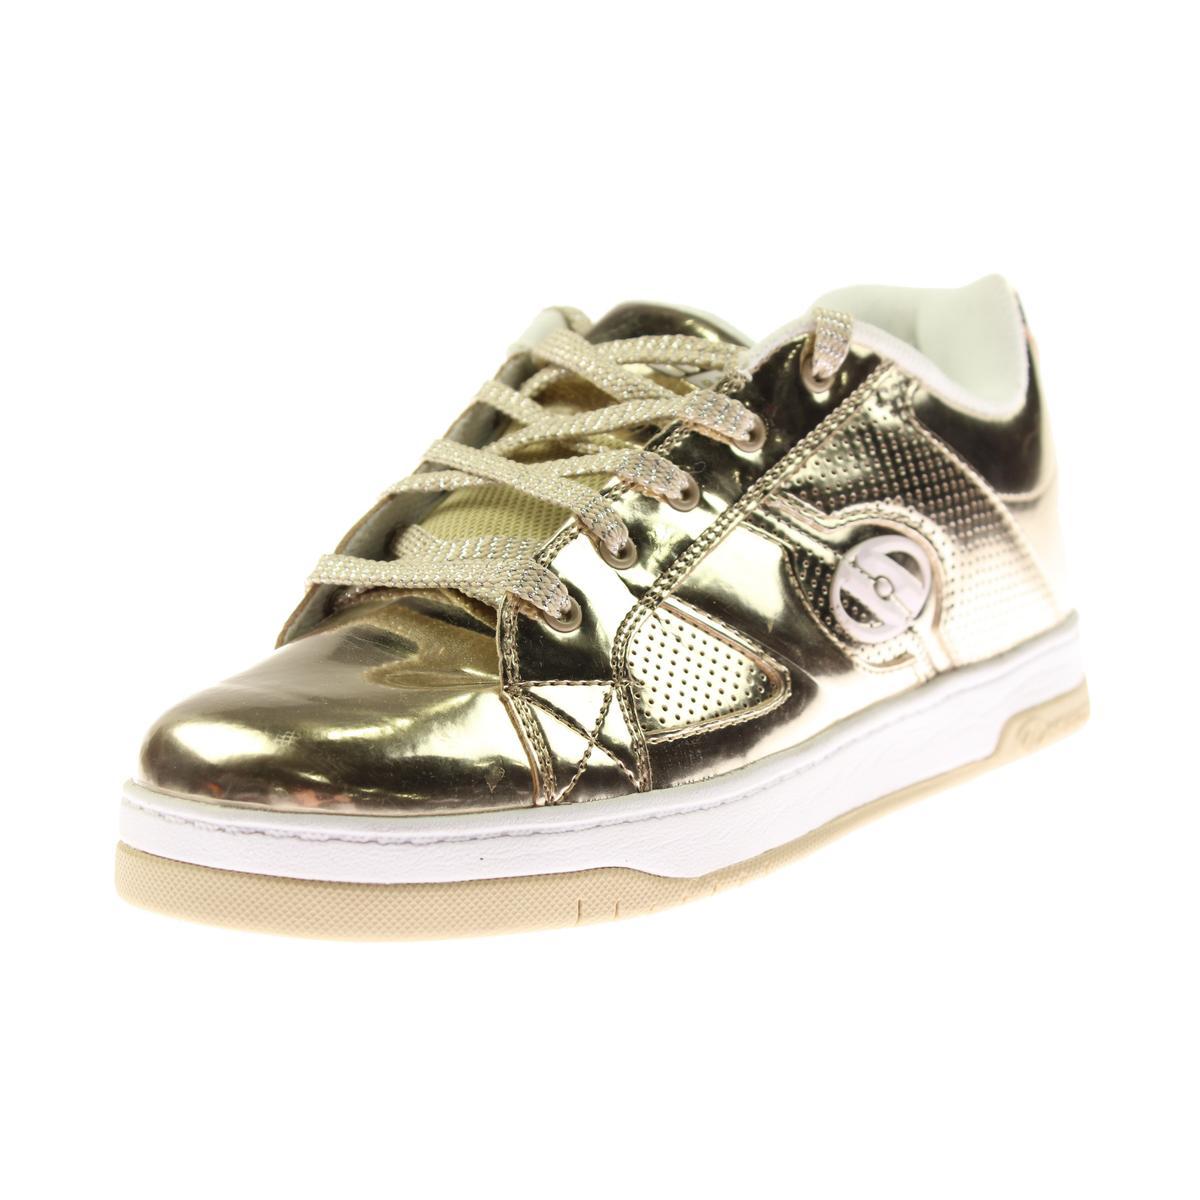 Heelys Womens Patent Colorblock Skate Shoes